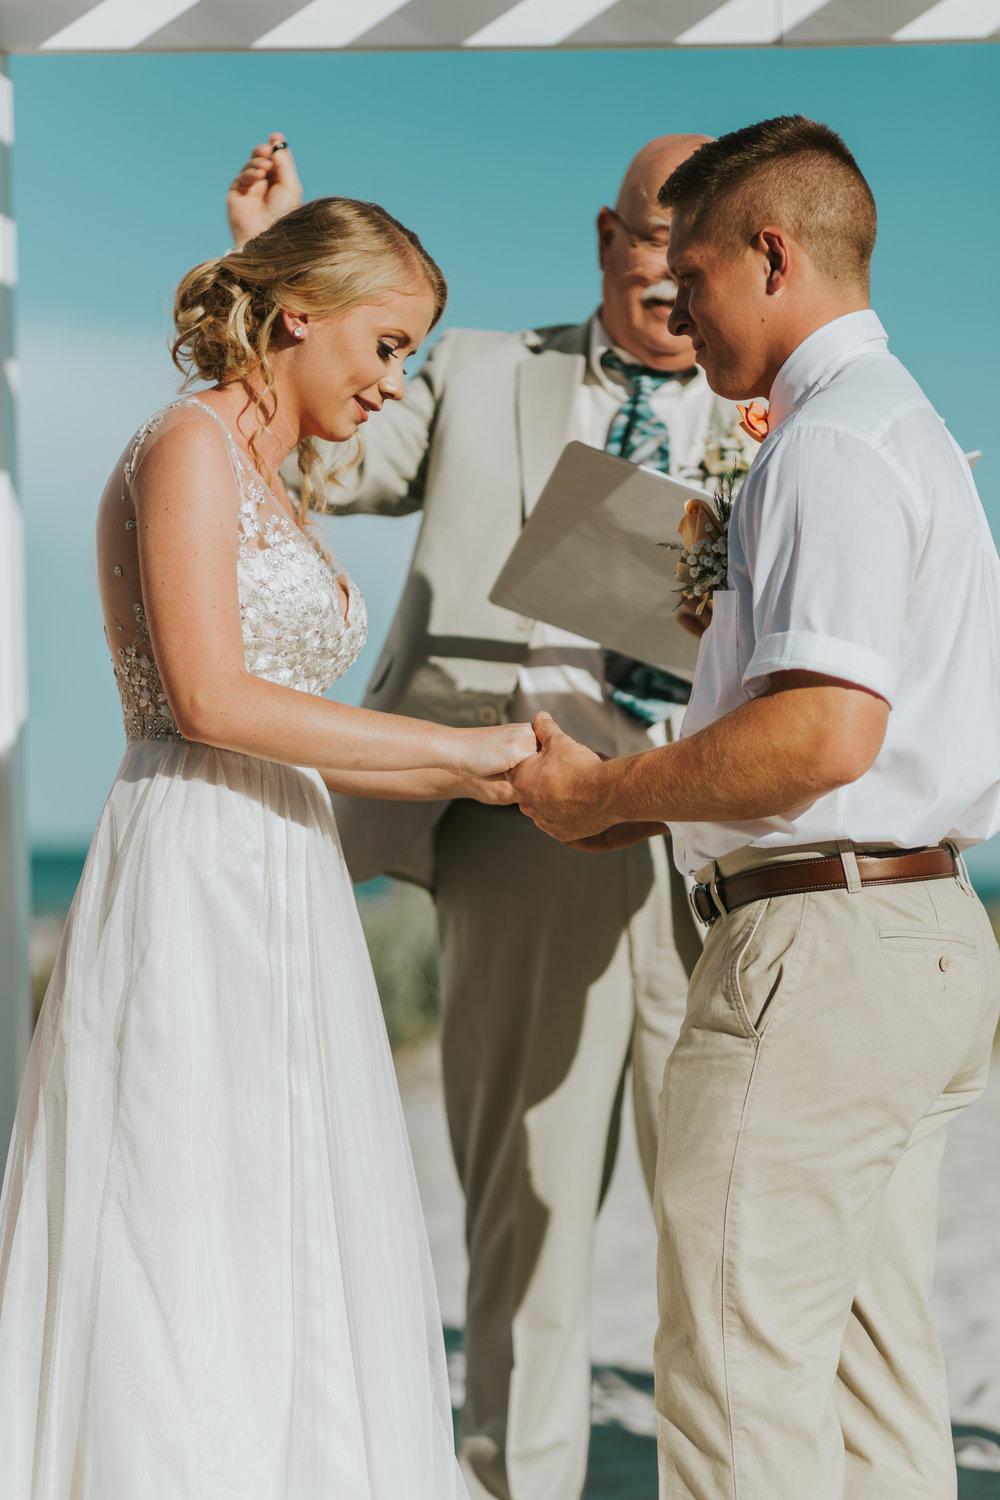 2016.07.13 Leah and Brenton Cocoa Beach Wedding (112 of 400).jpg